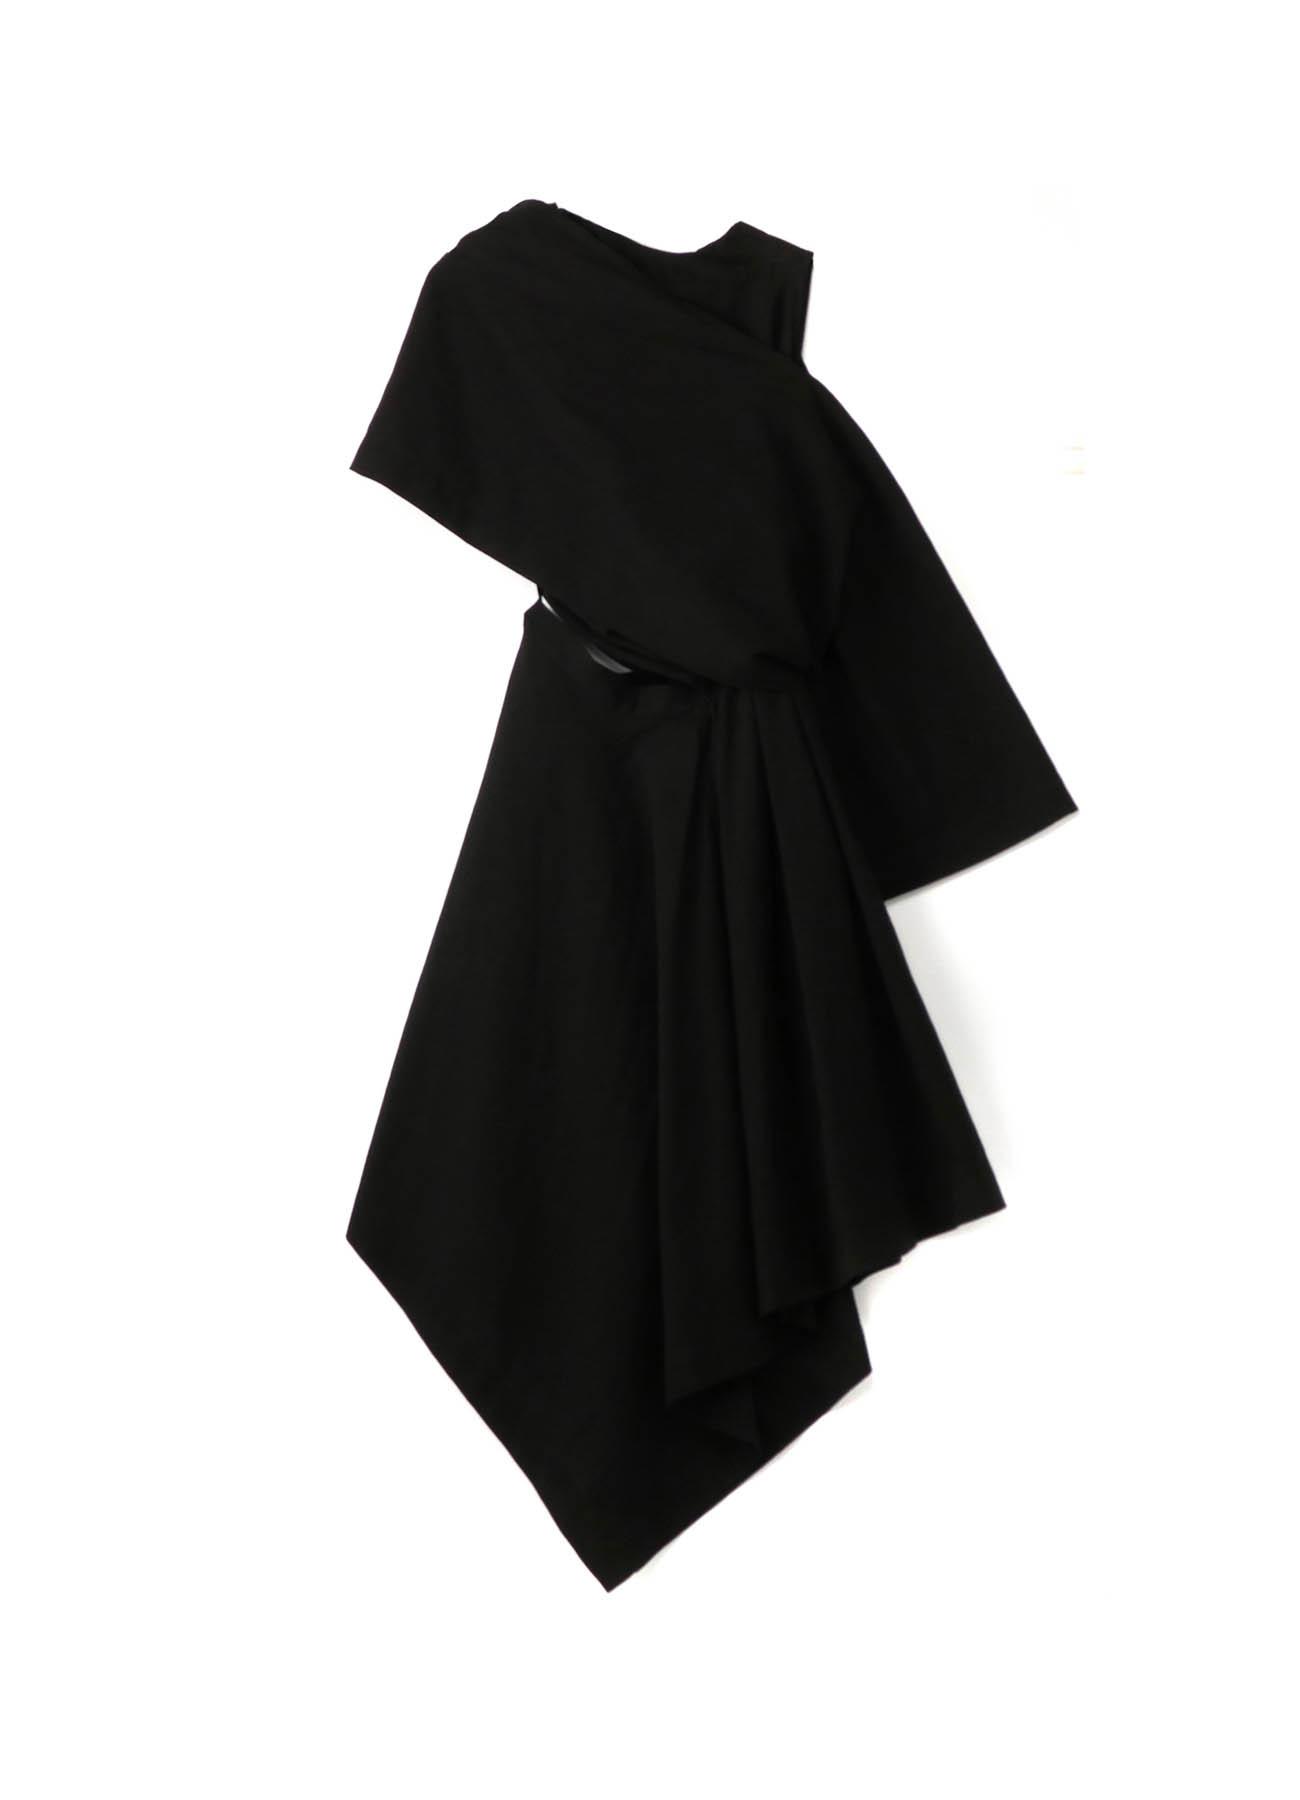 C/Li Calico A Drape Dress